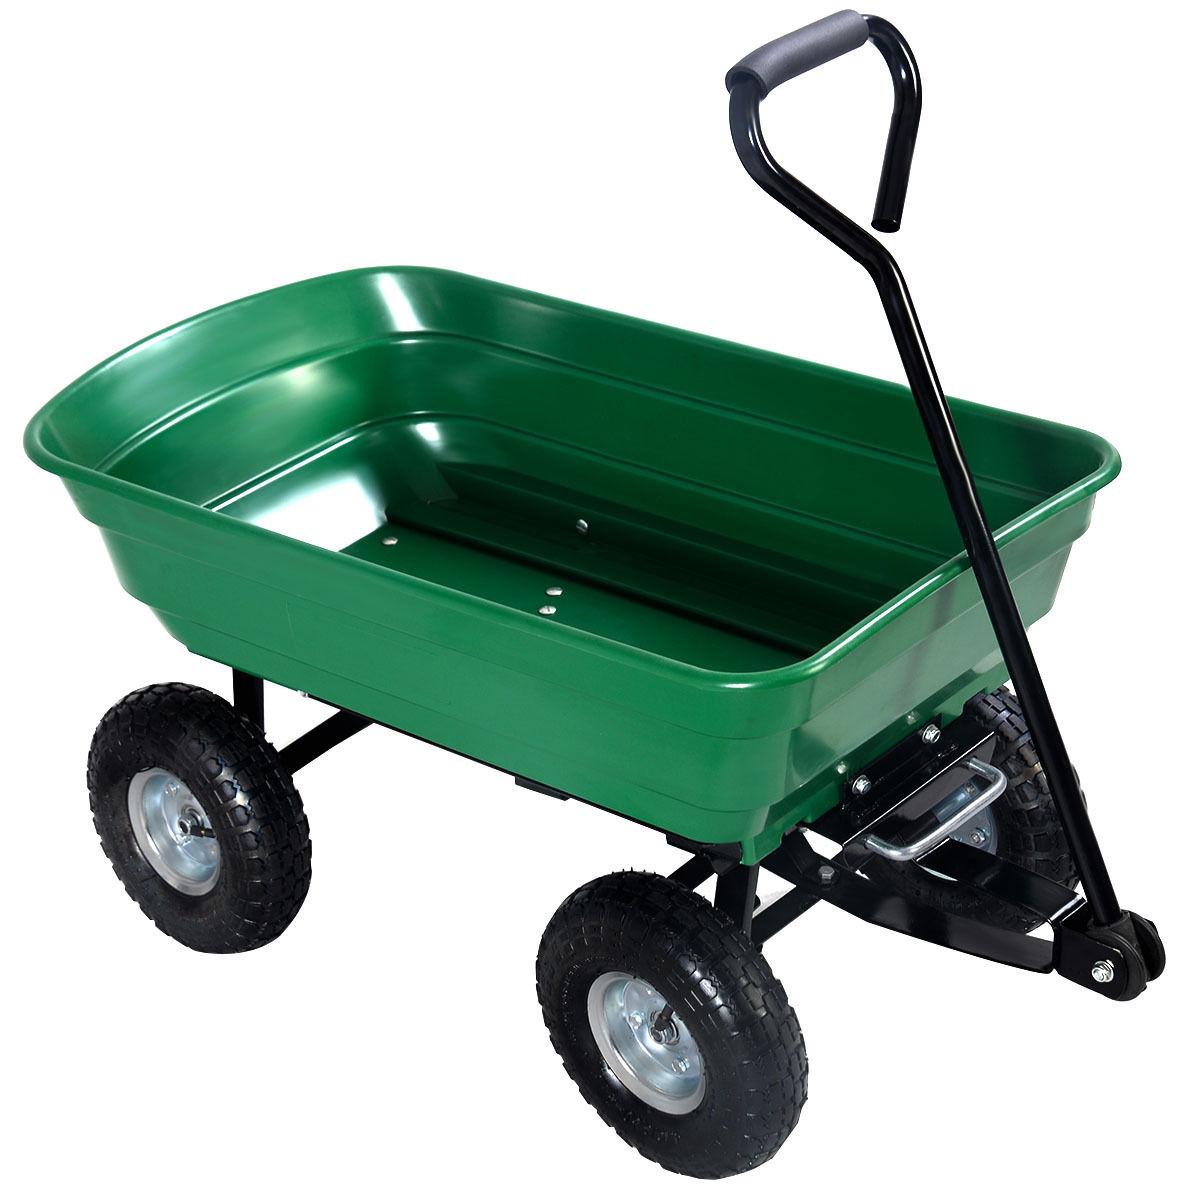 New 650 Lbs Garden Dump Cart Wagon Wheel Barrow Tc2145s